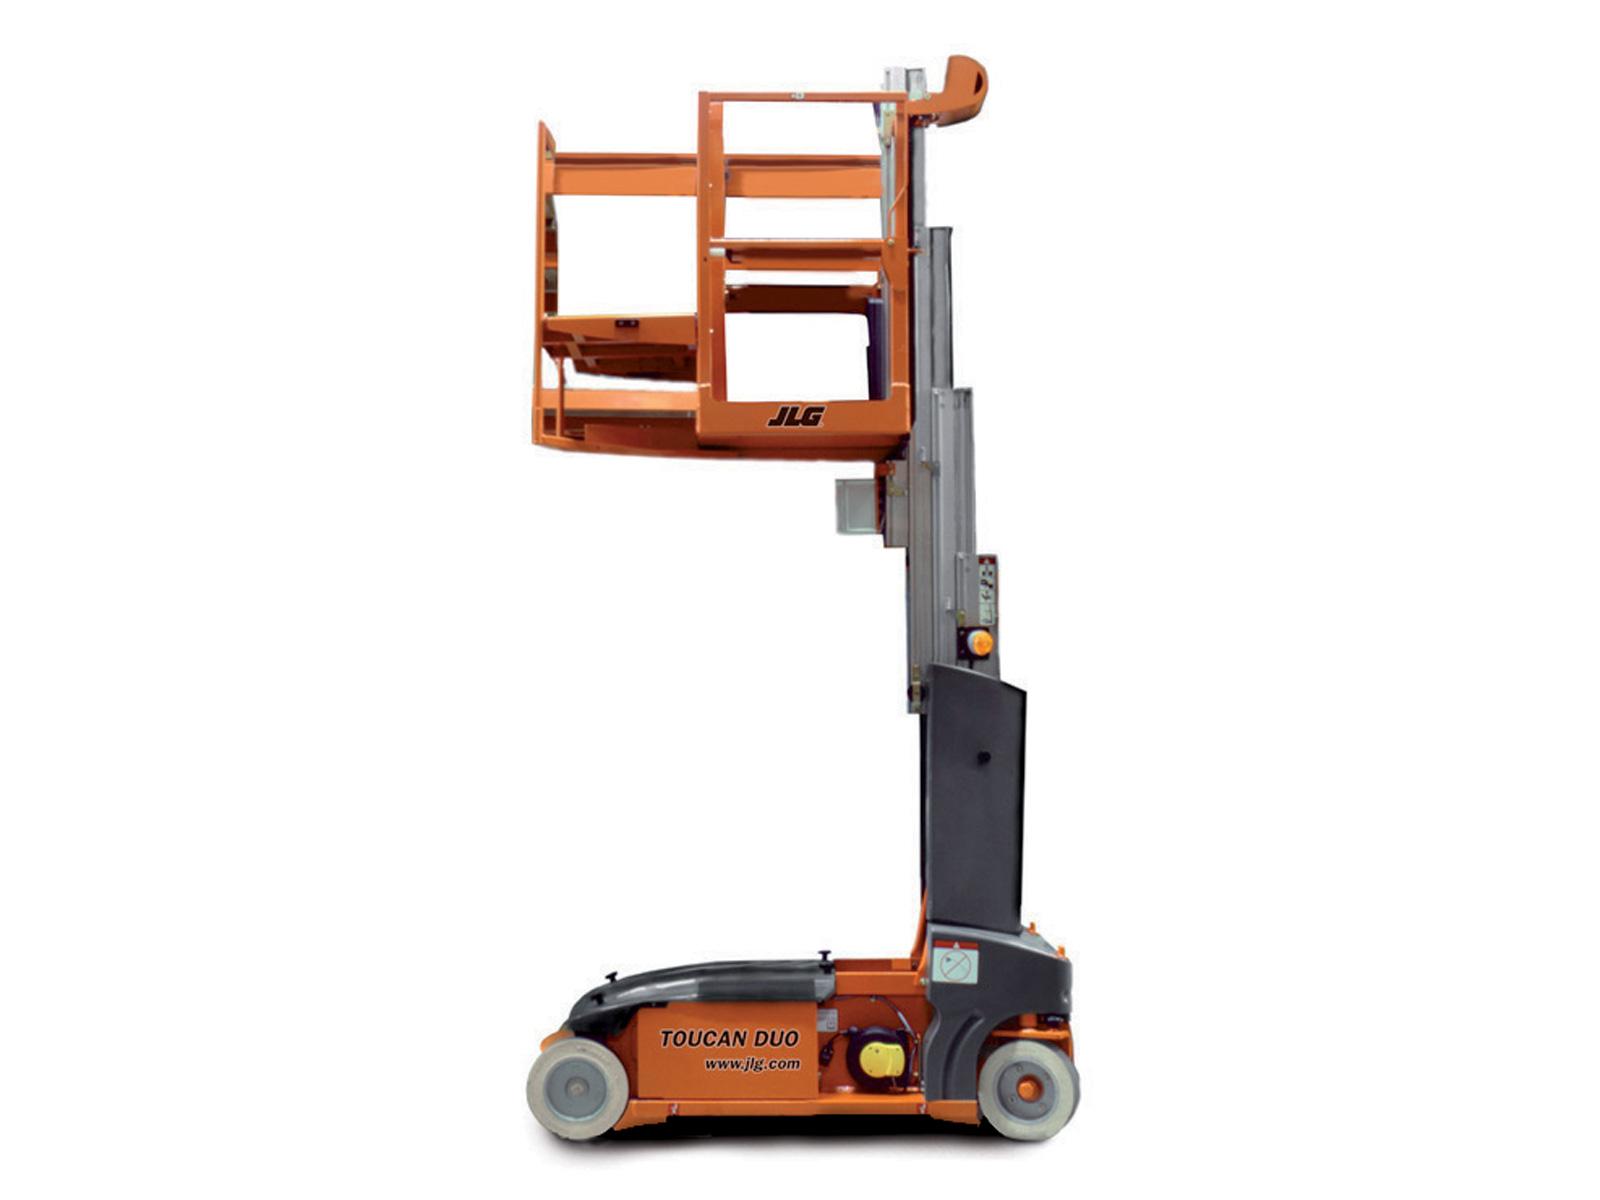 toucan duo vertical mast lift jlg. Black Bedroom Furniture Sets. Home Design Ideas